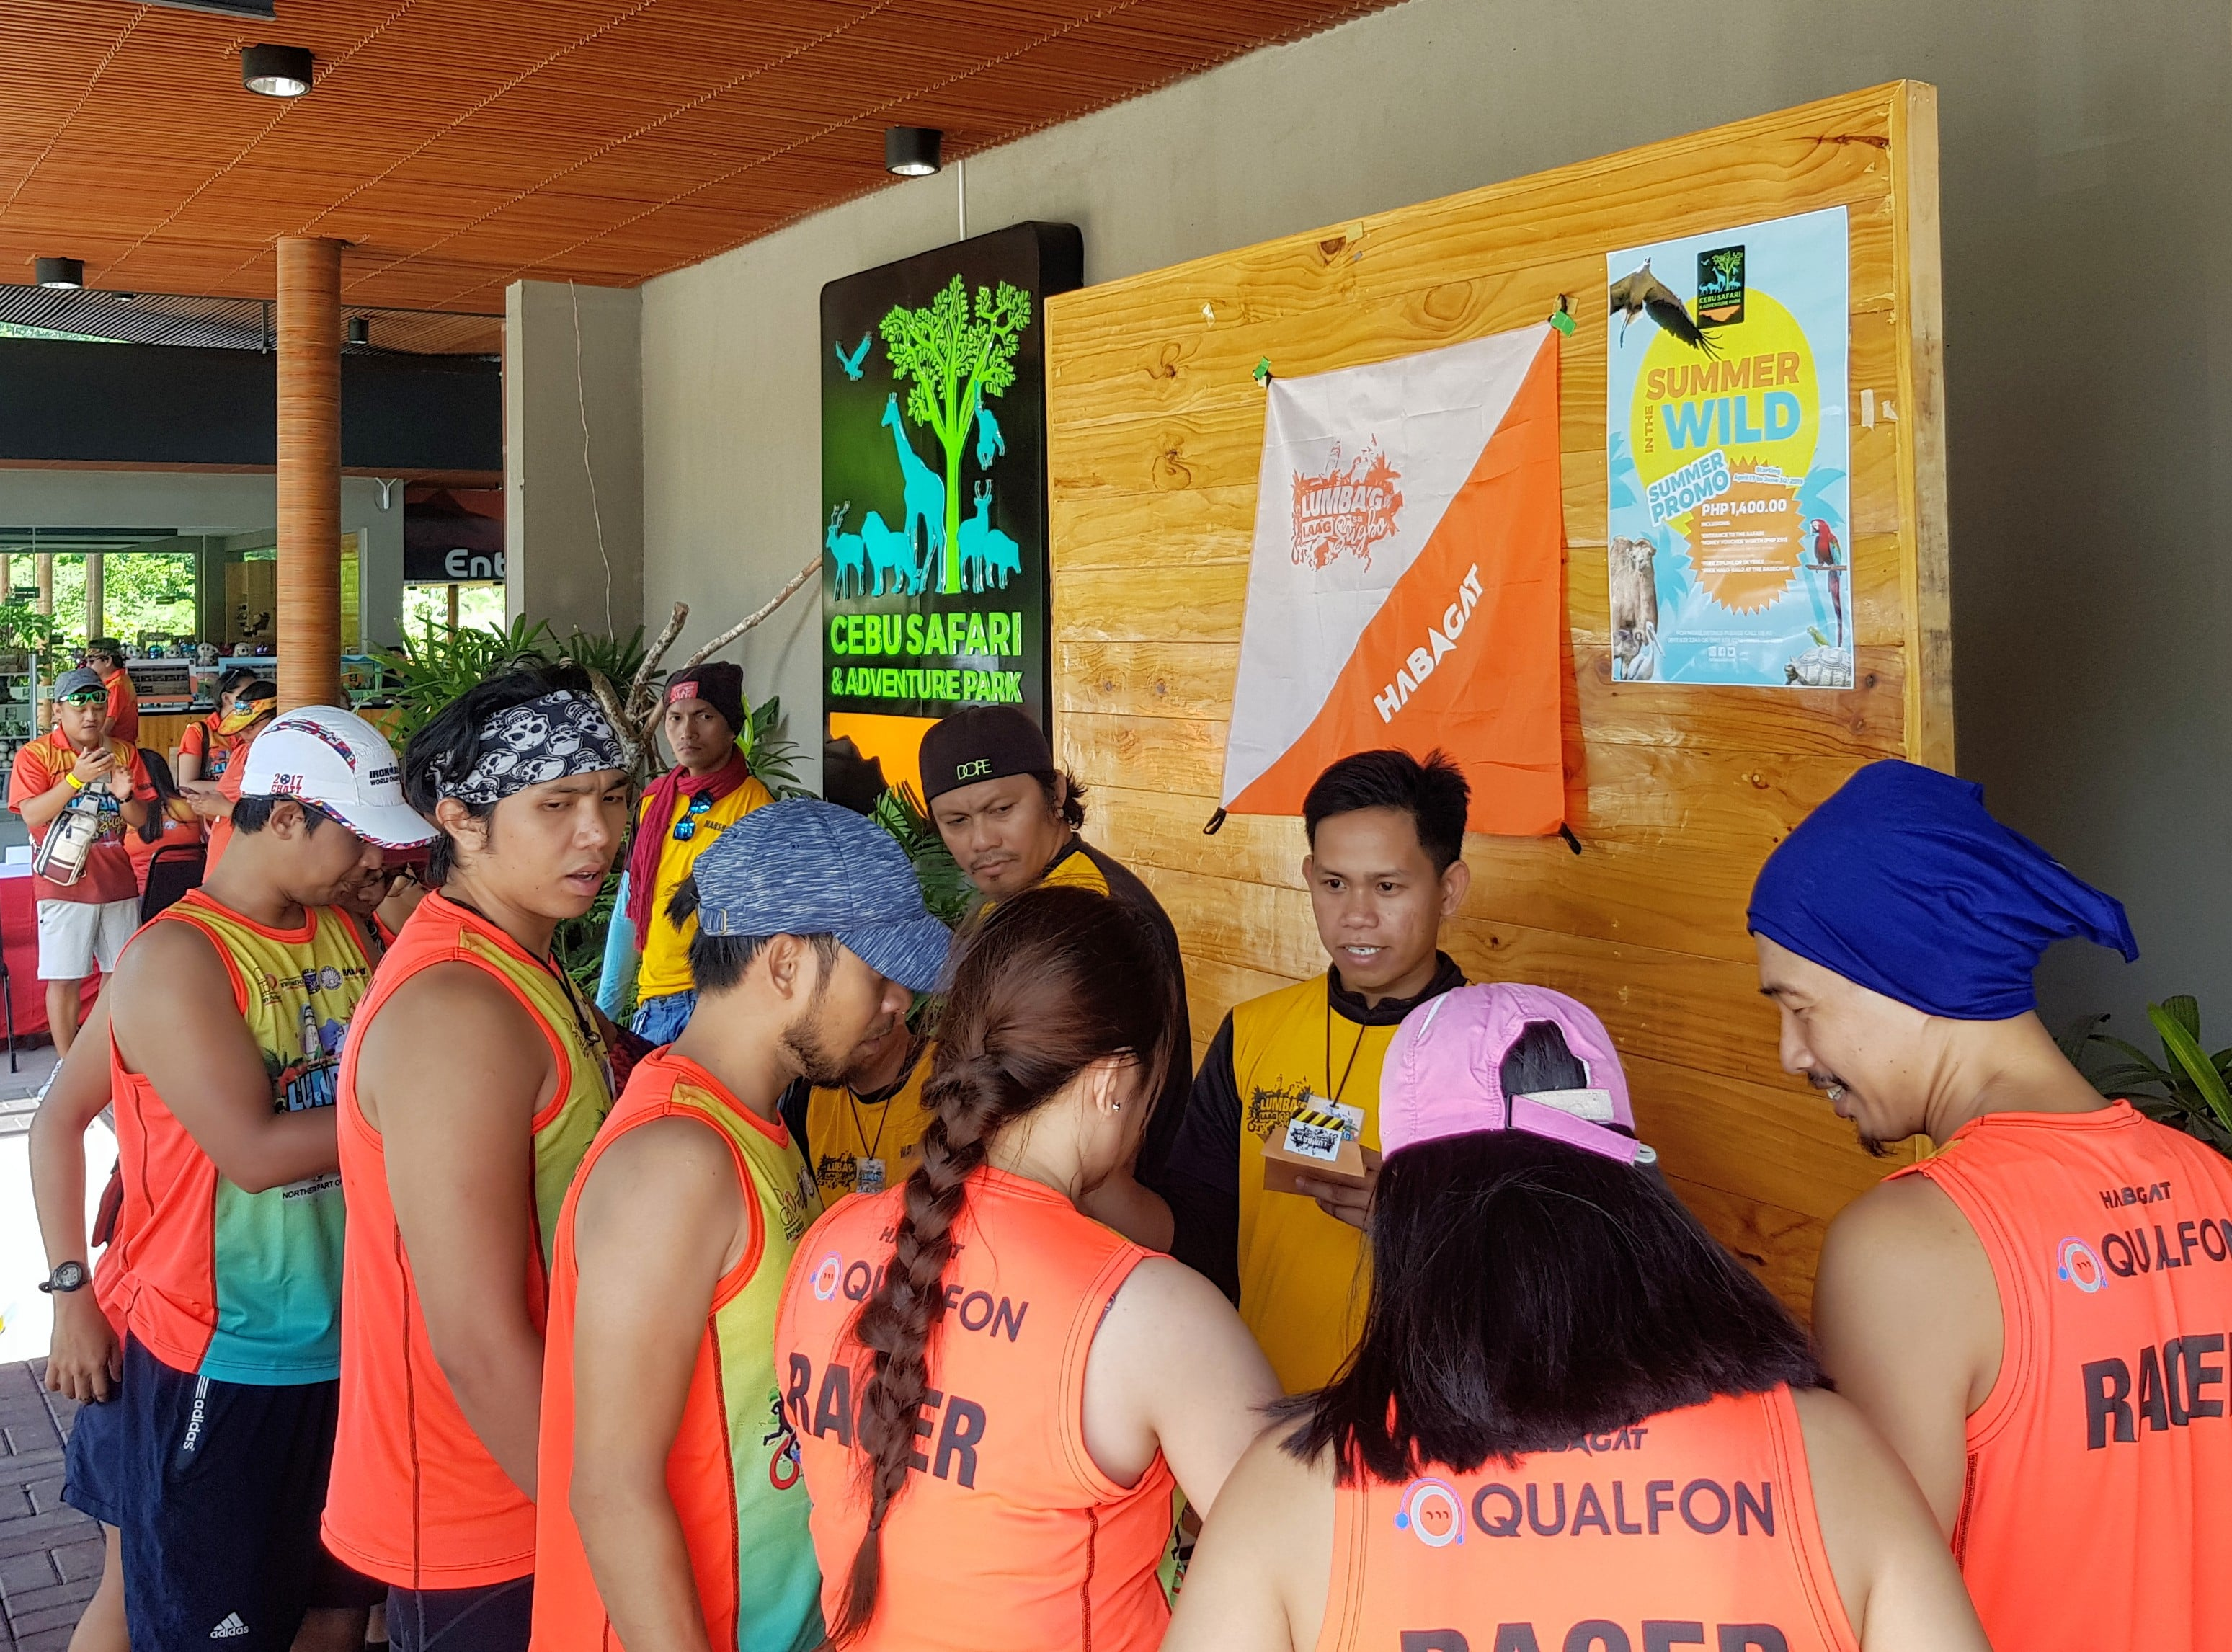 Lumbag Laag sa Sugbo with their orange and yellow jersey visits Cebu Safari & Adventure Park